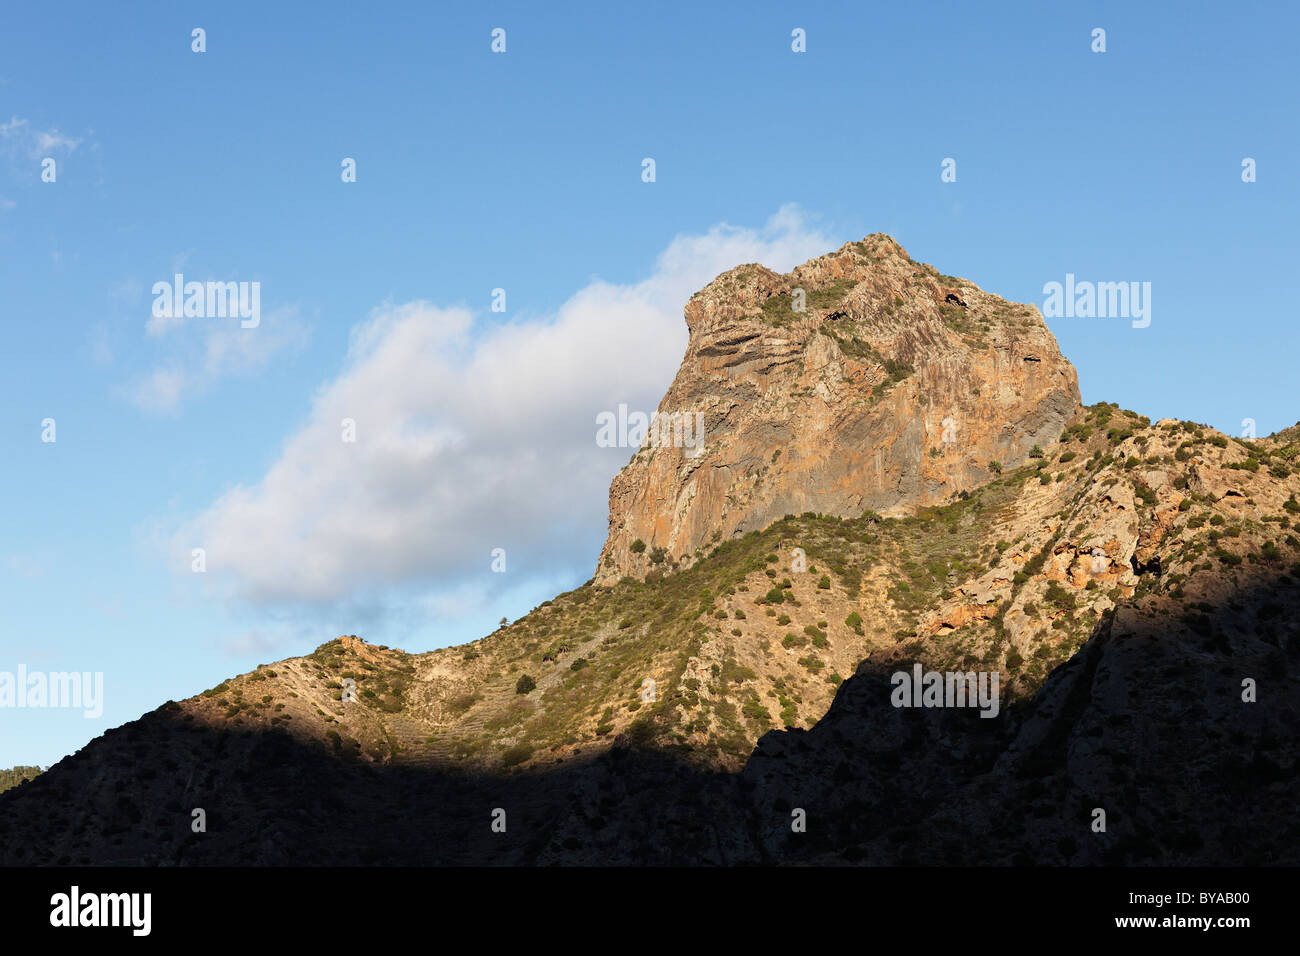 Roque Cano Mountain in Vallehermoso, La Gomera, Canary Islands, Spain, Europe - Stock Image